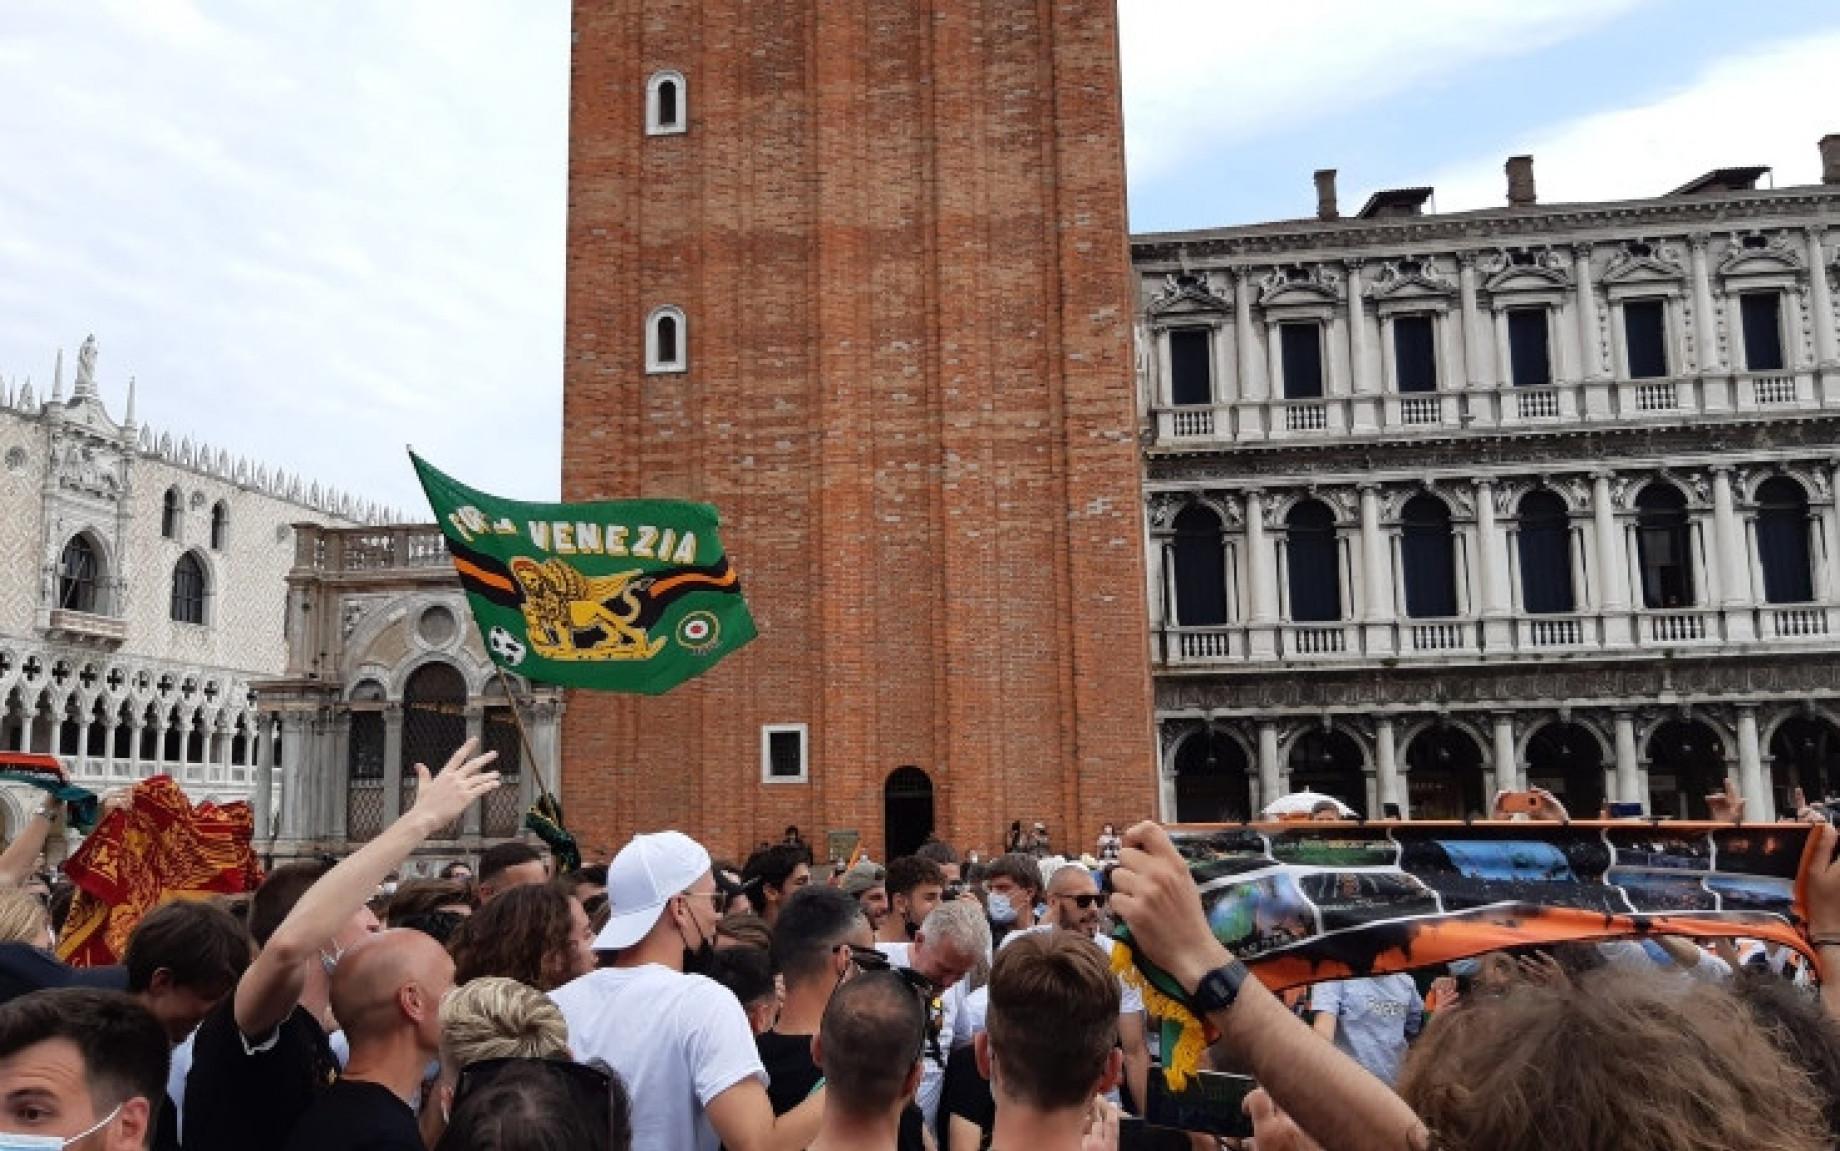 venezia-tifosi-festa-3-gdm.jpg